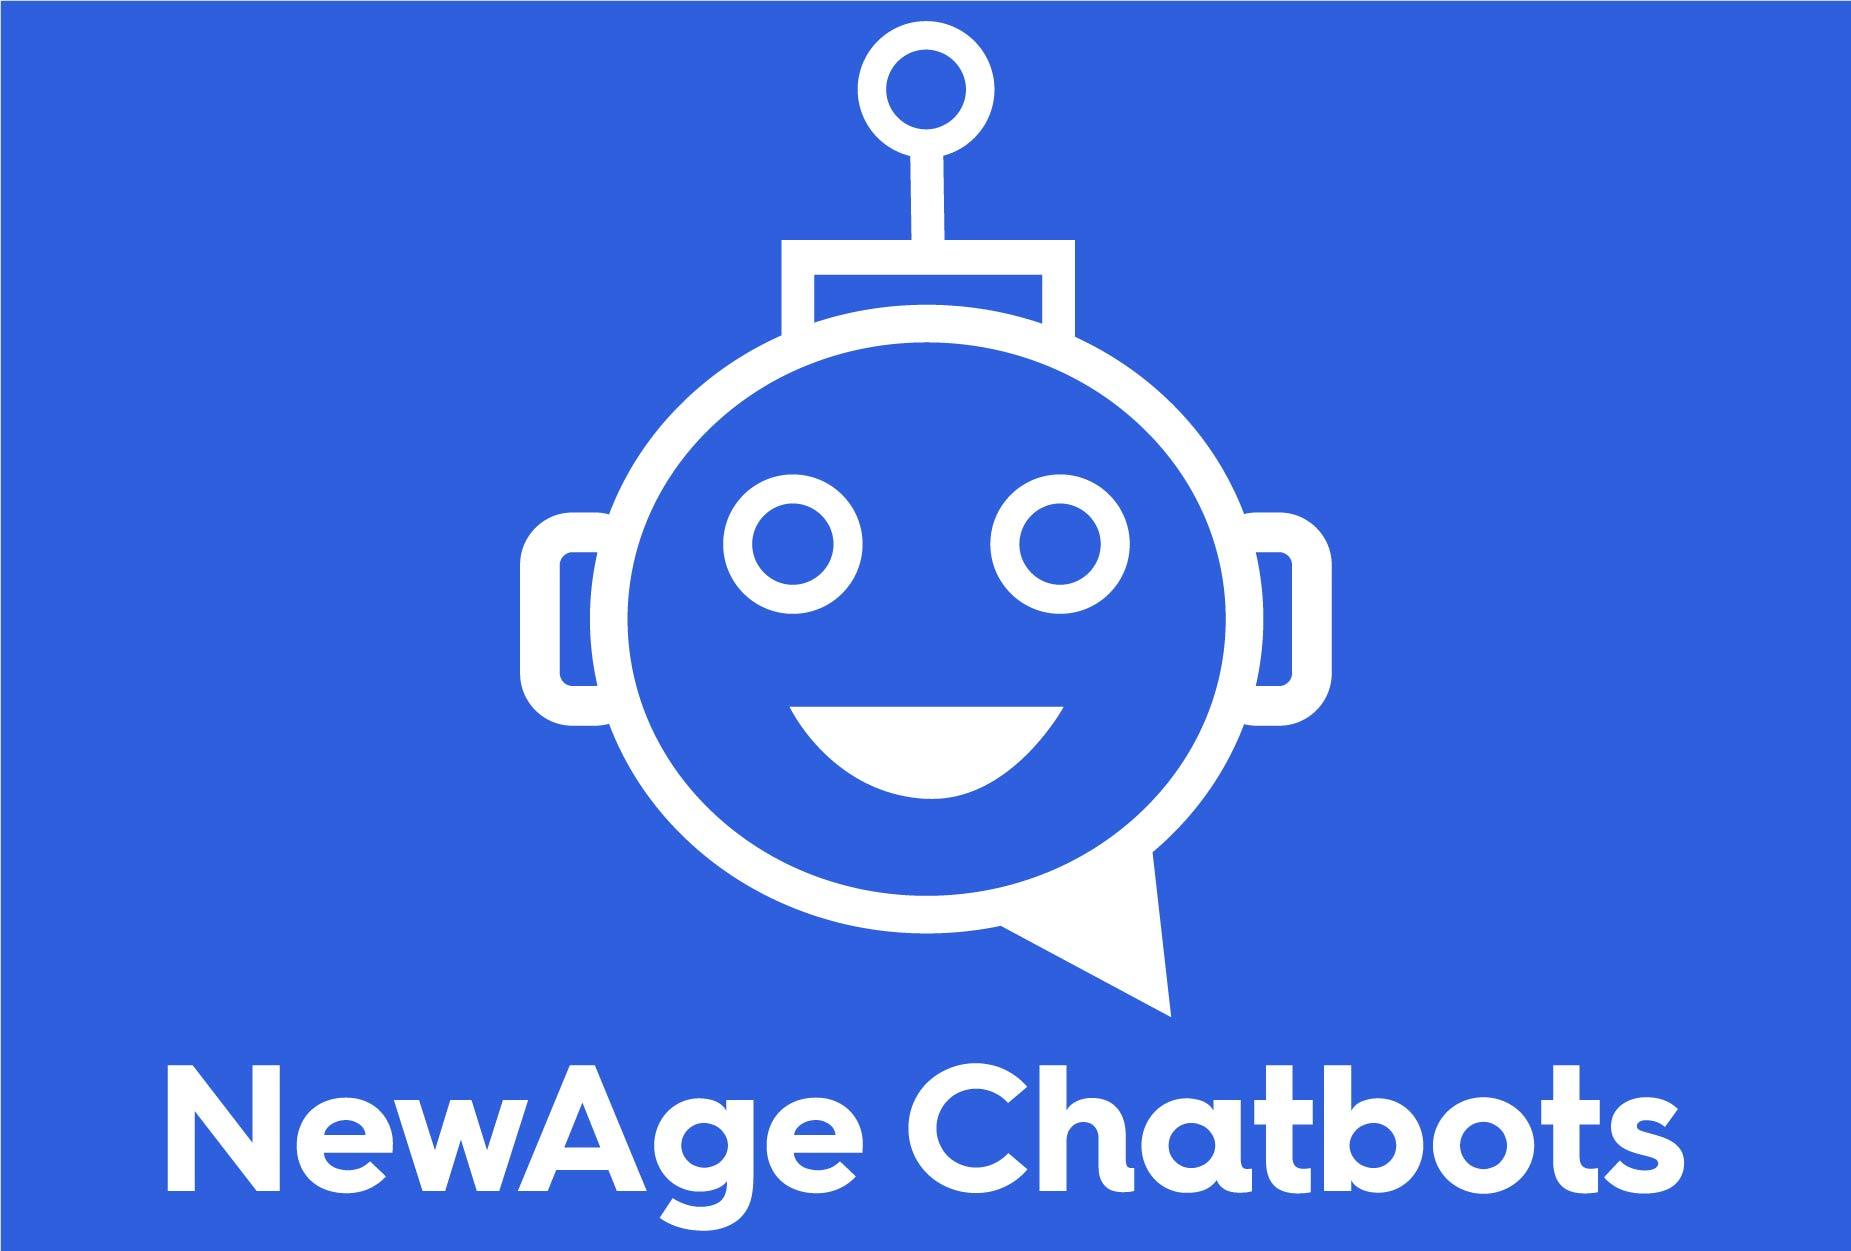 NewAge Chatbots by Shanelle, a chatbot developer